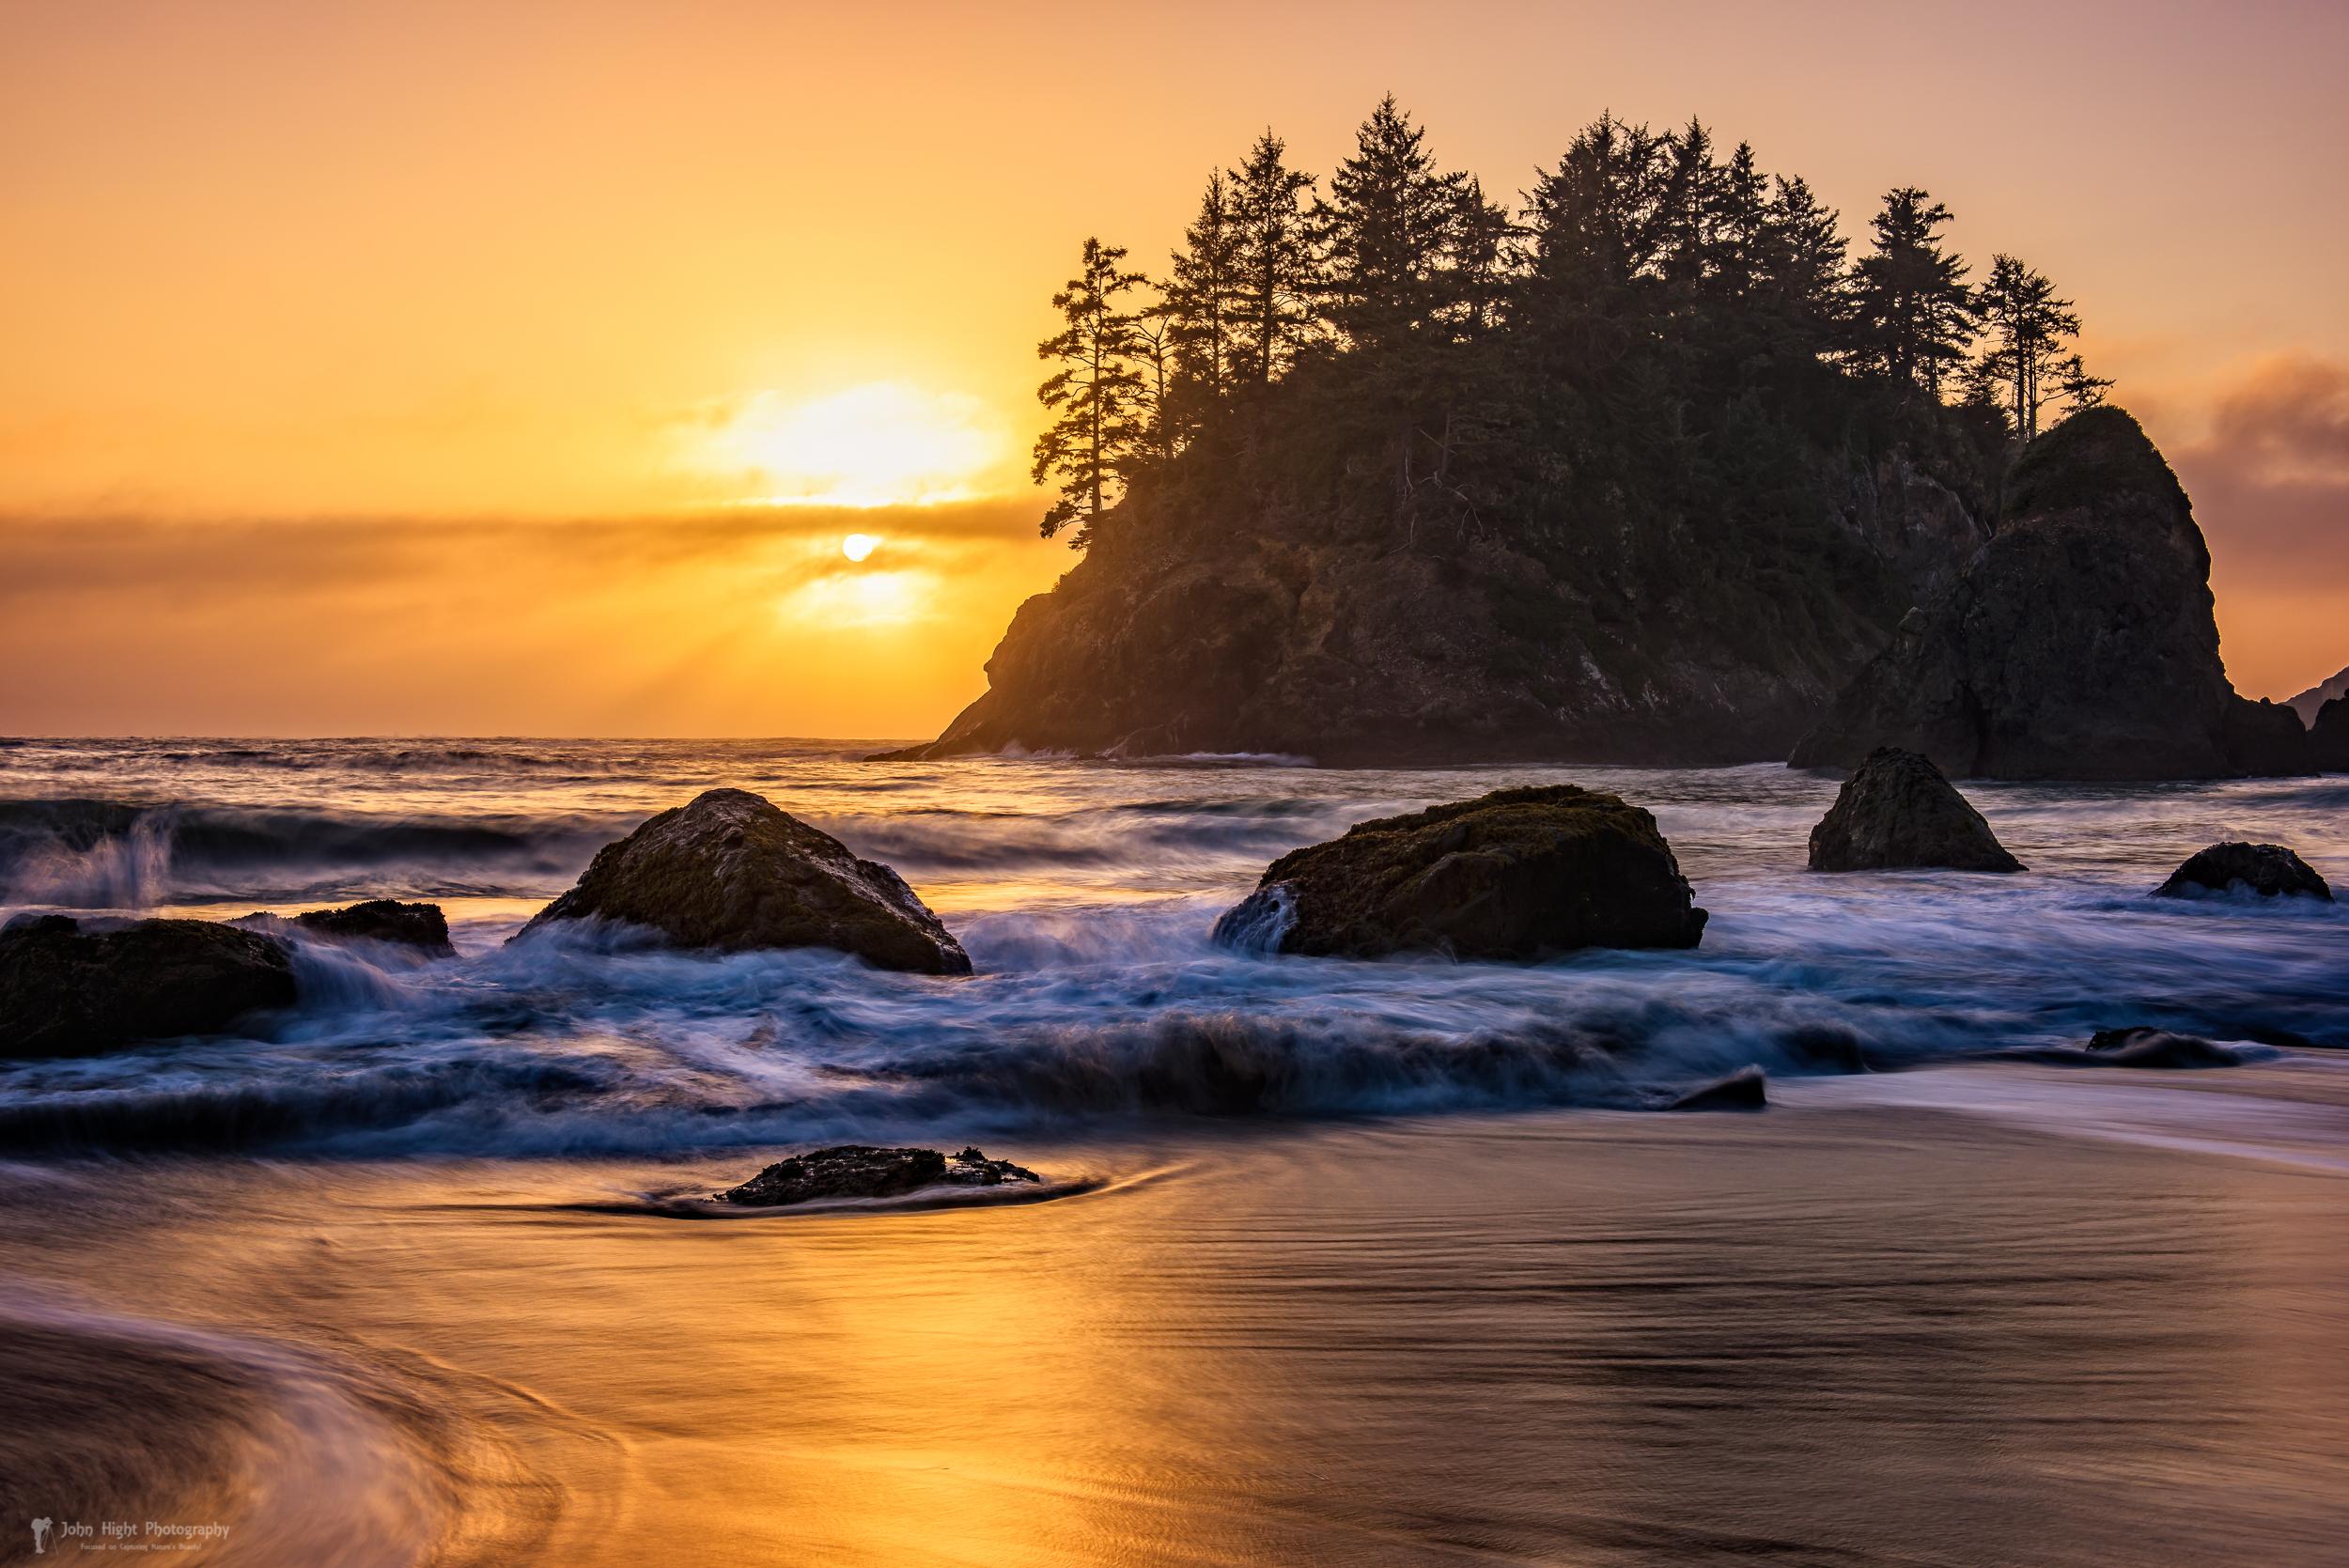 Marine Layer Sunset at Trinidad, California